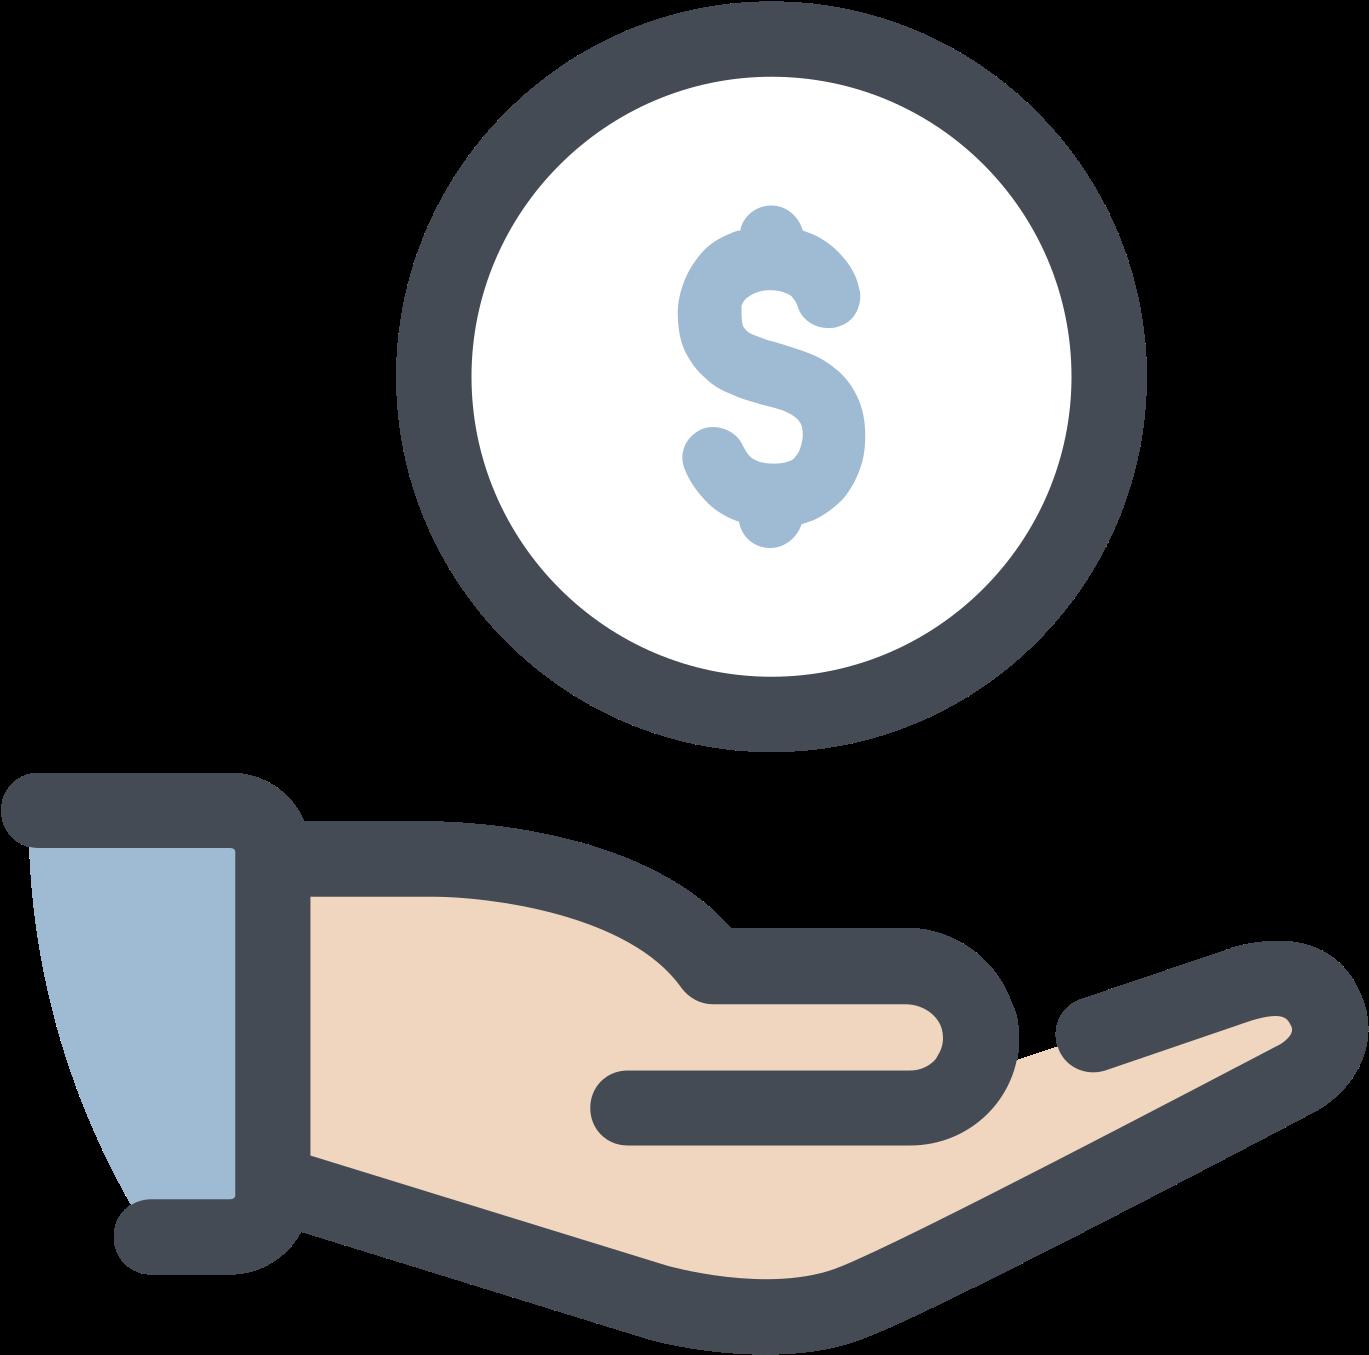 loan on lic policy